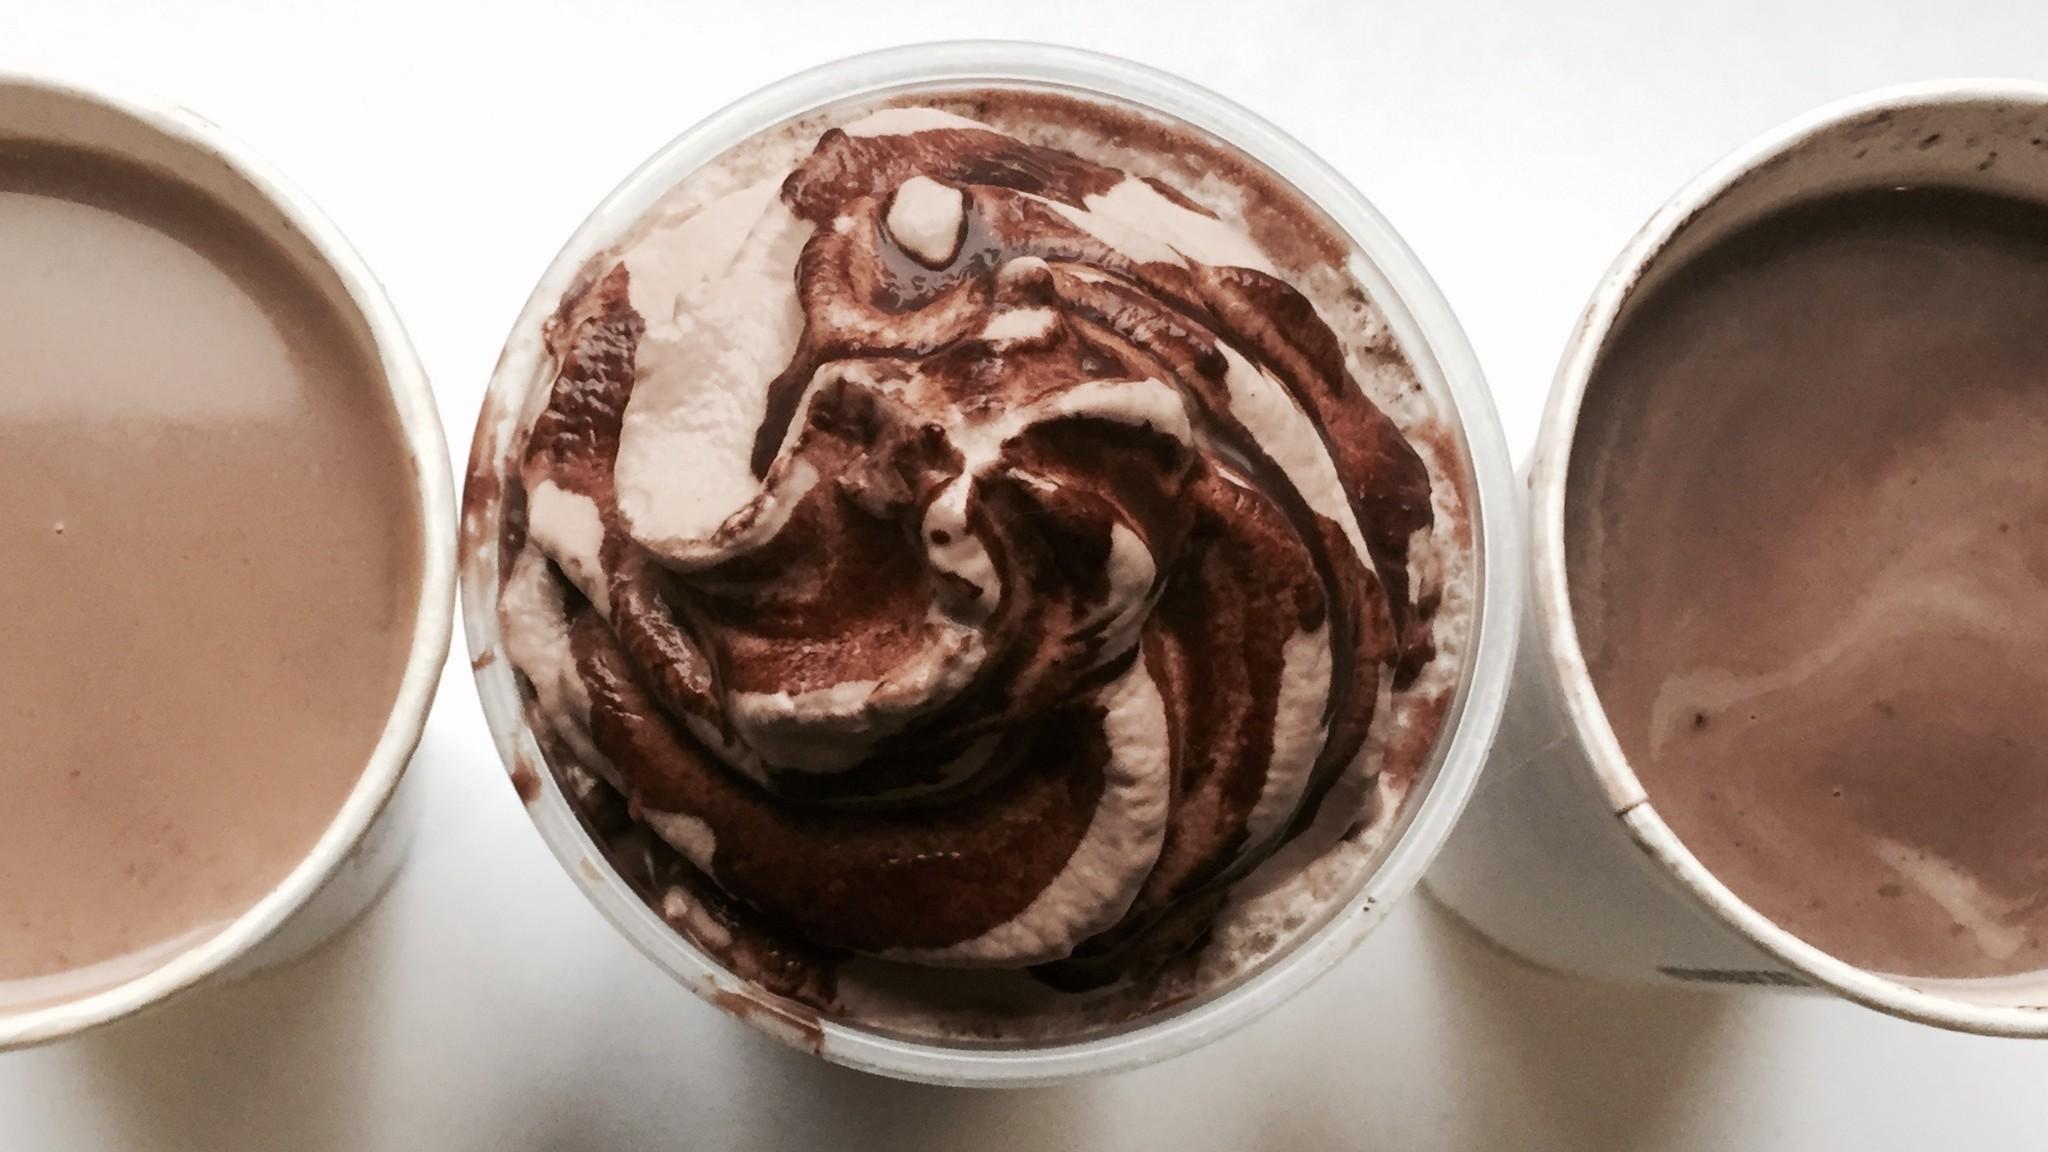 Starbucks' Valentine's Day chocolate trio: Best new drinks ...